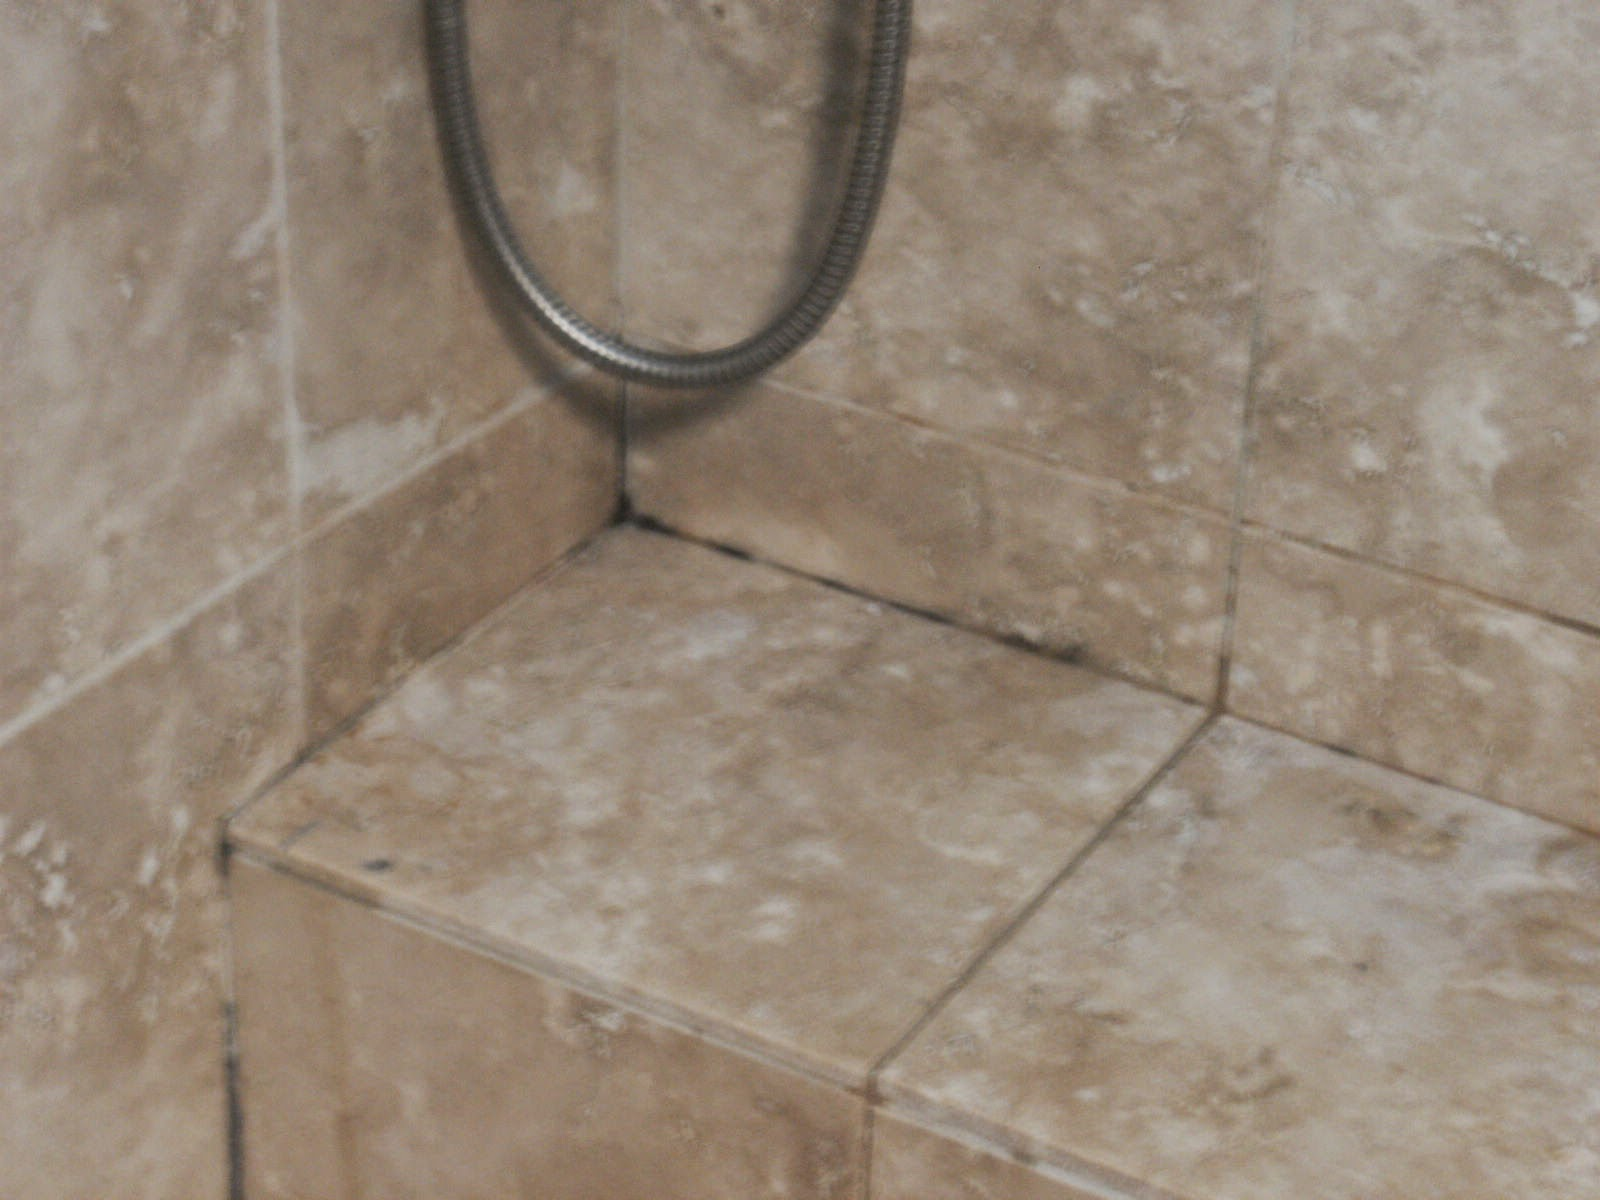 Black mold travertine tile revisit confessions of a tile setter black mold travertine tile revisit dailygadgetfo Images